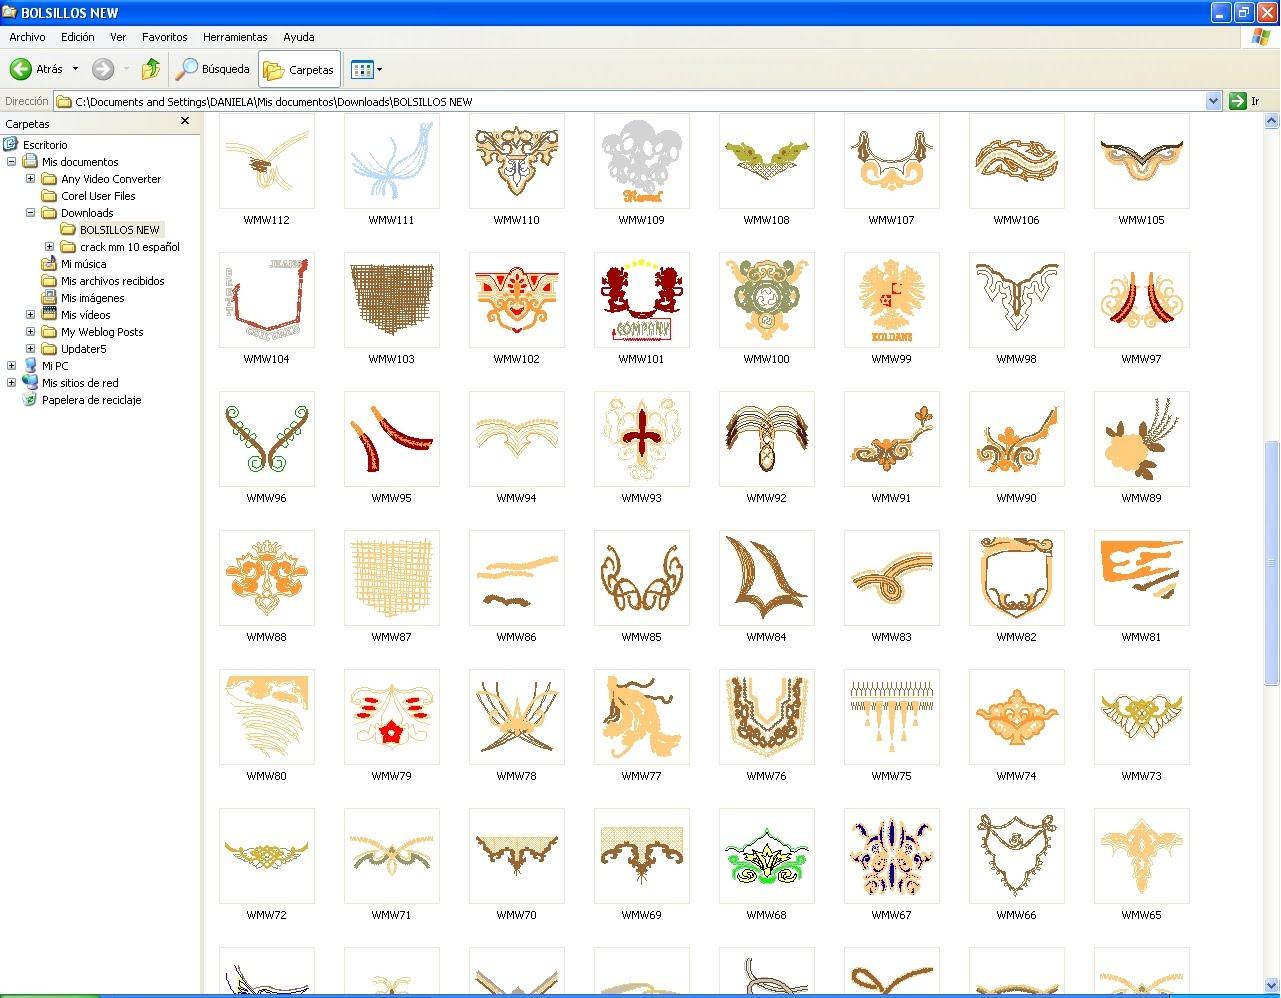 Manual wilcom embroidery studio E1 532 29574g50mnkk